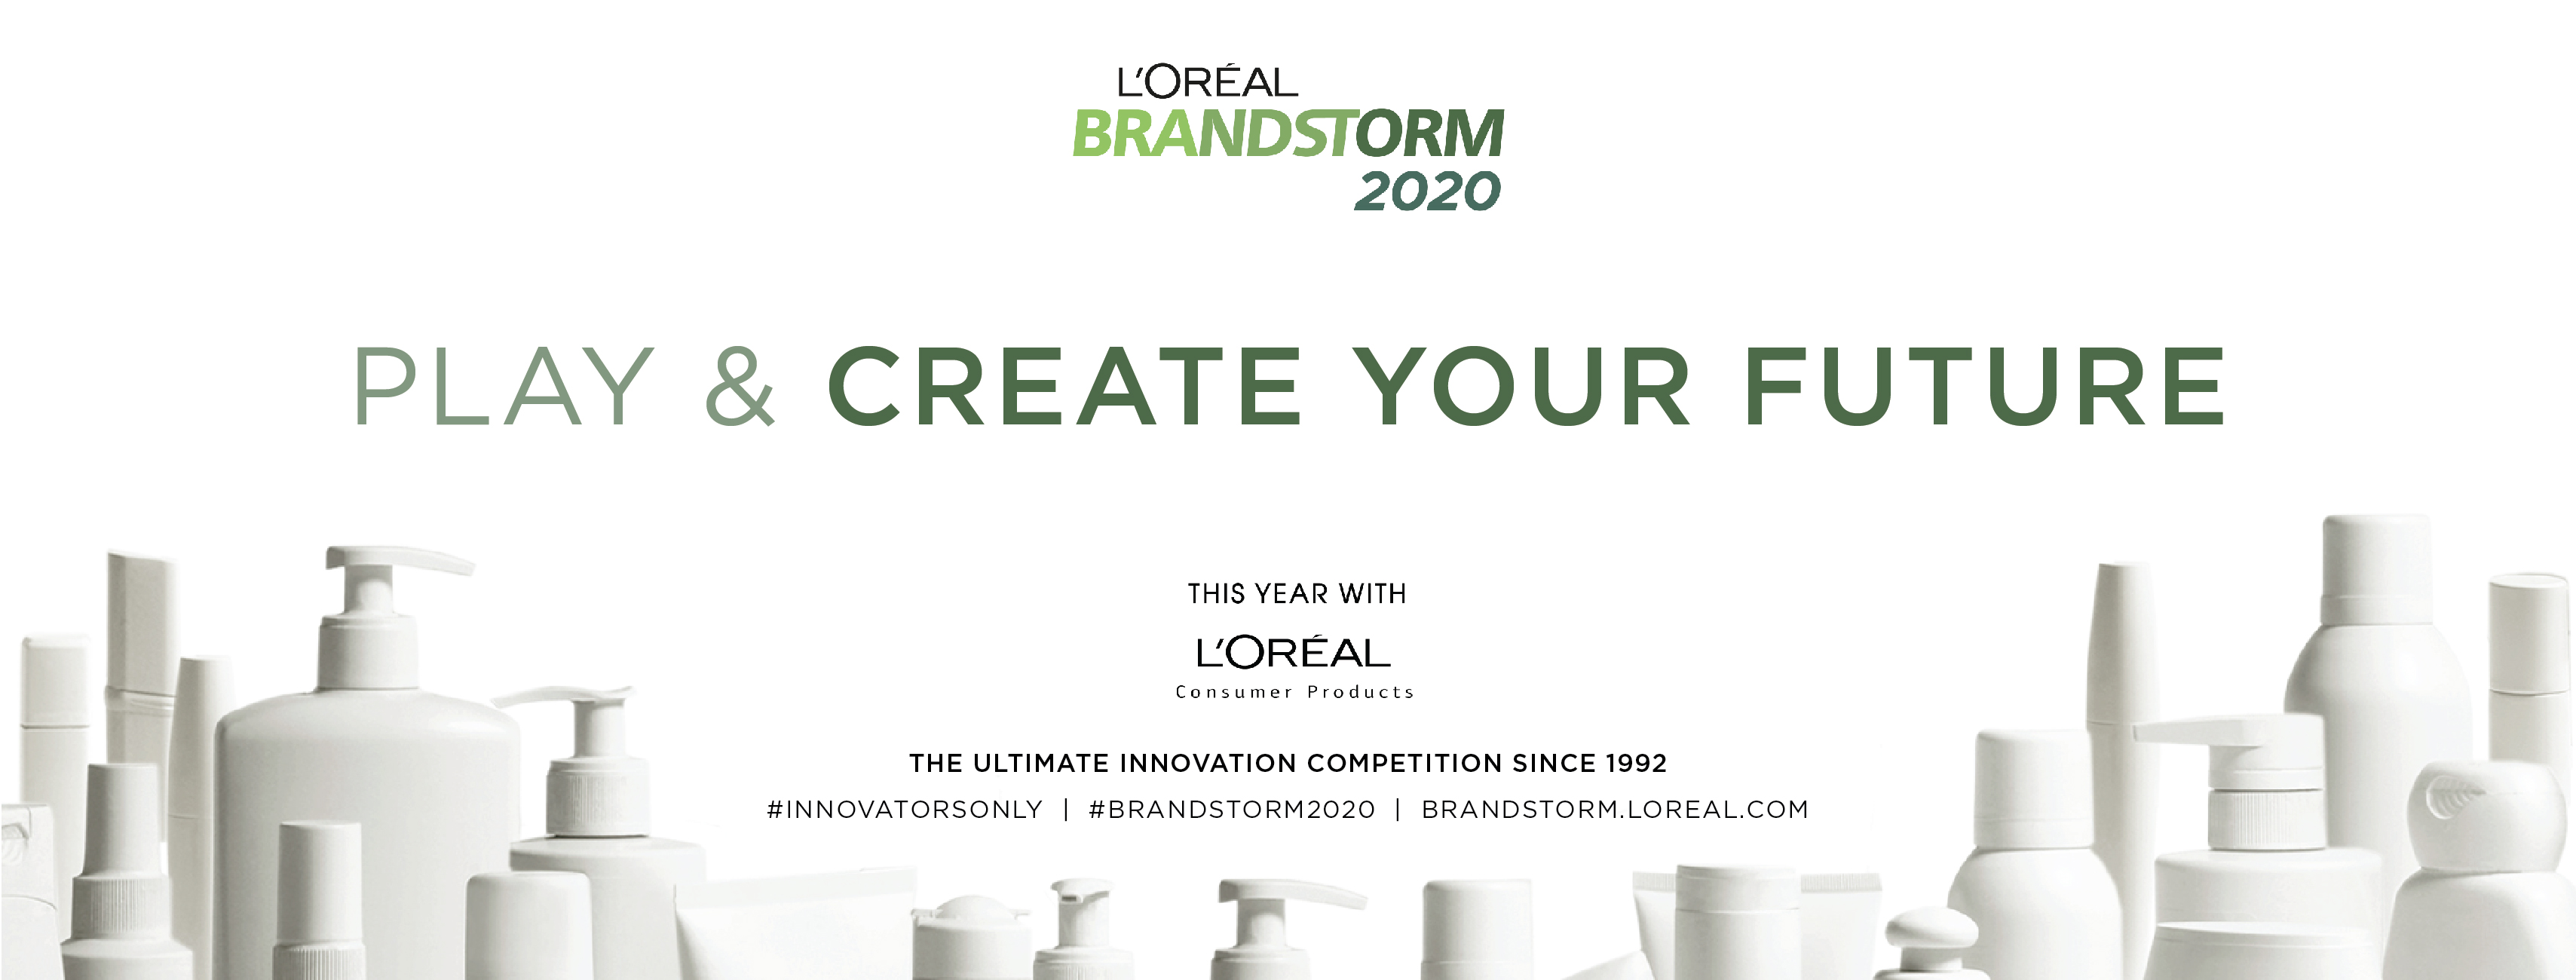 L'Oréal Brandstorm 2020